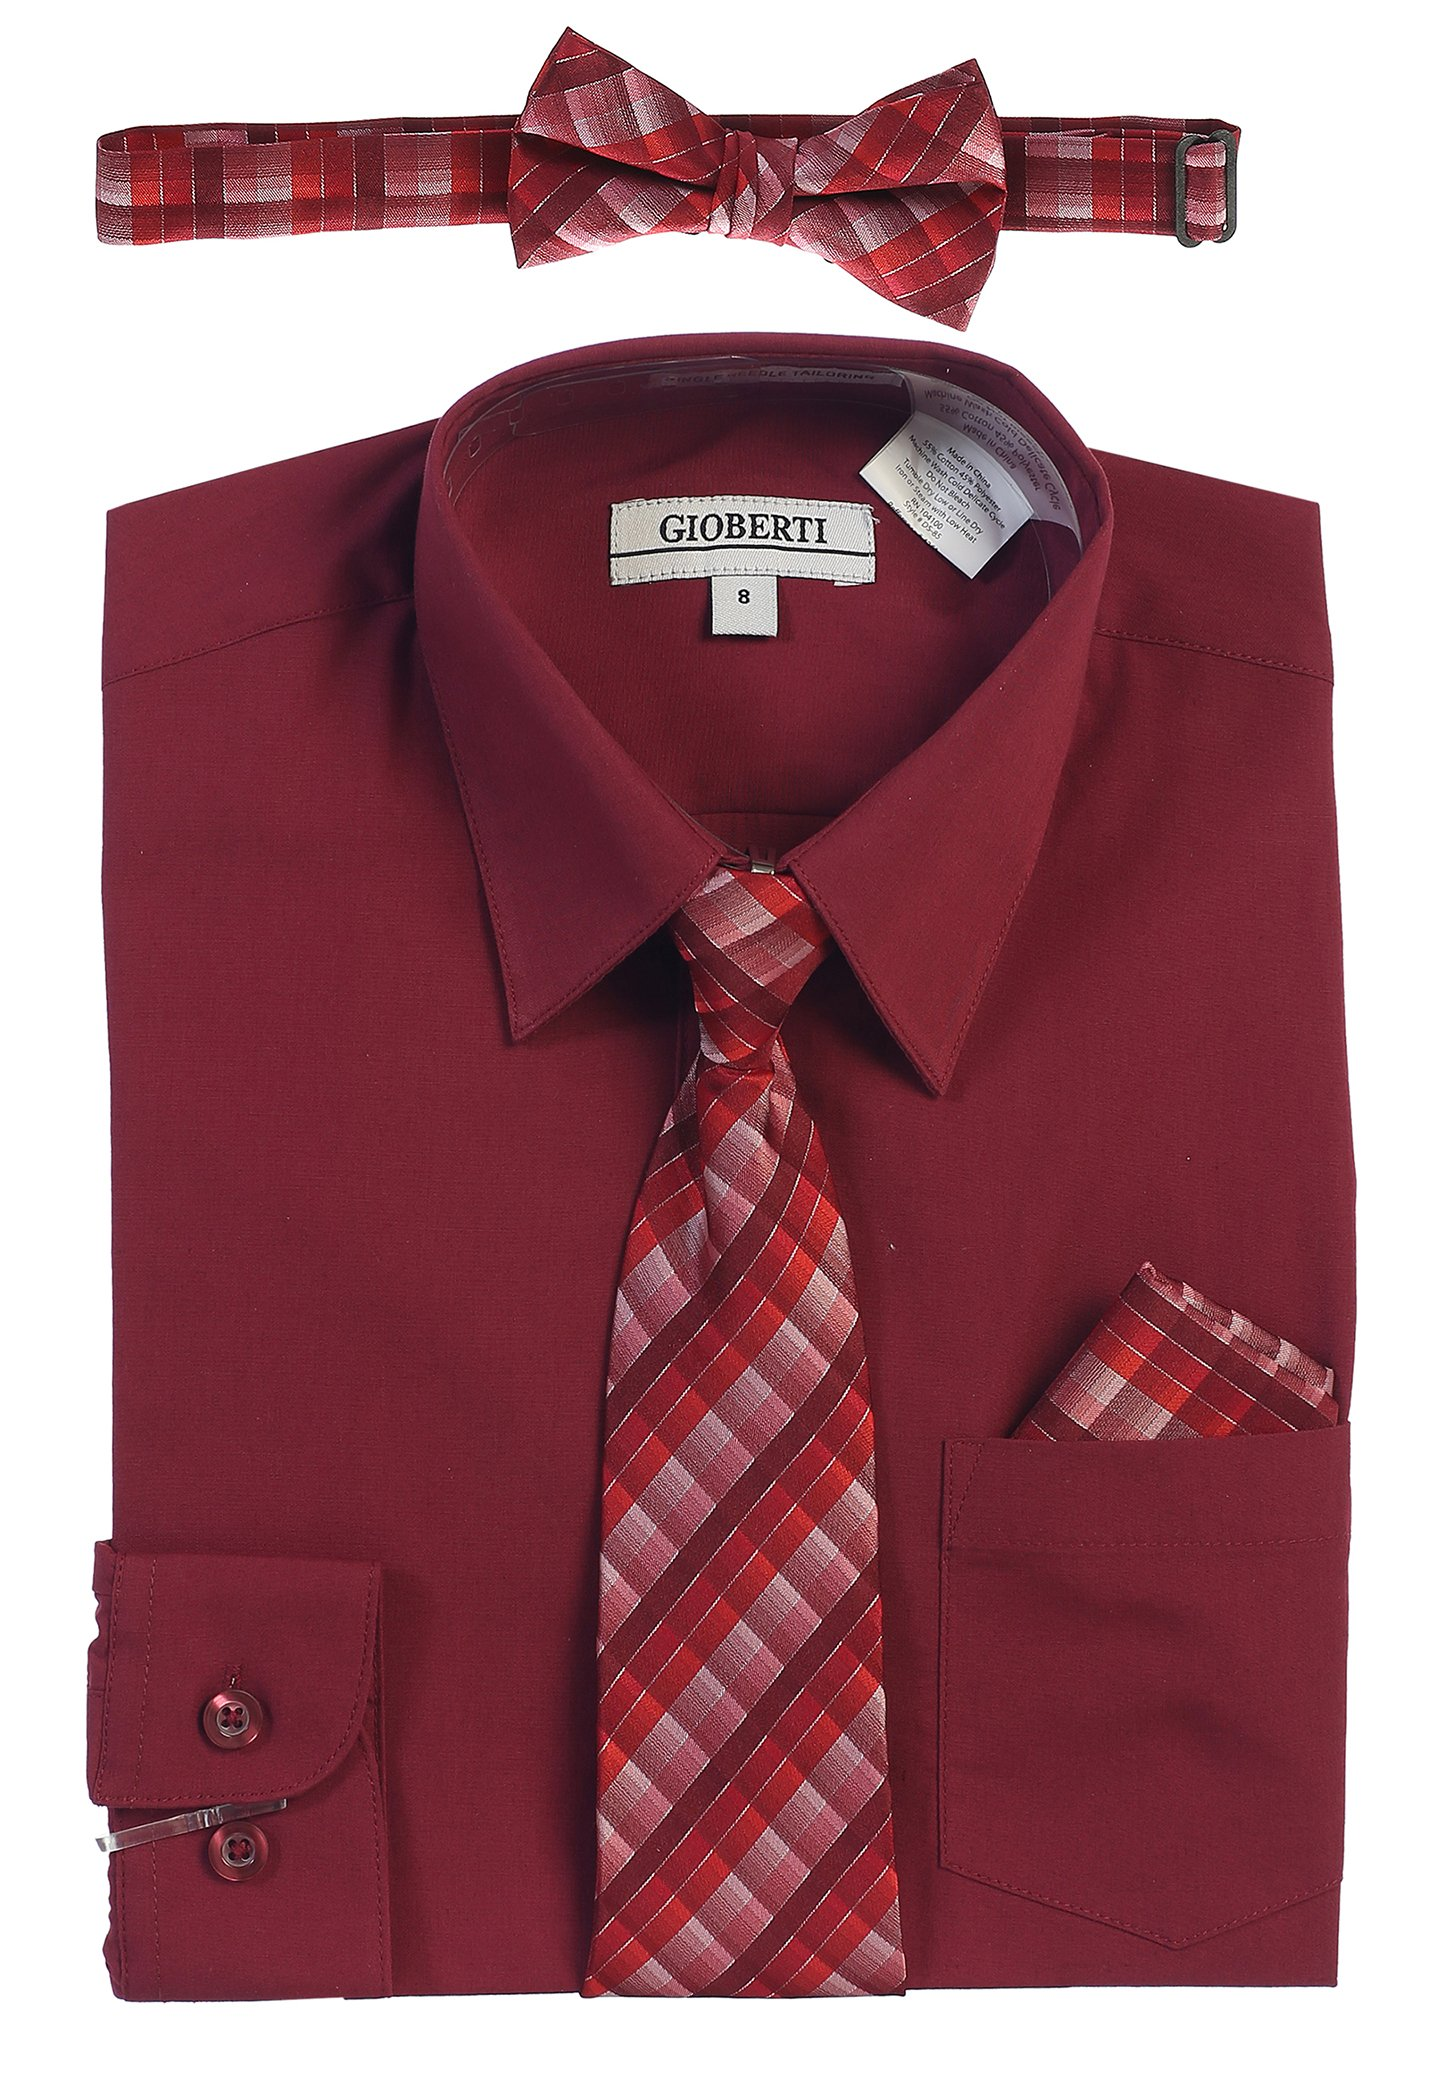 Gioberti Boy's Long Sleeve Dress Shirt and Plaid Tie Set, Burgundy, Size 4T